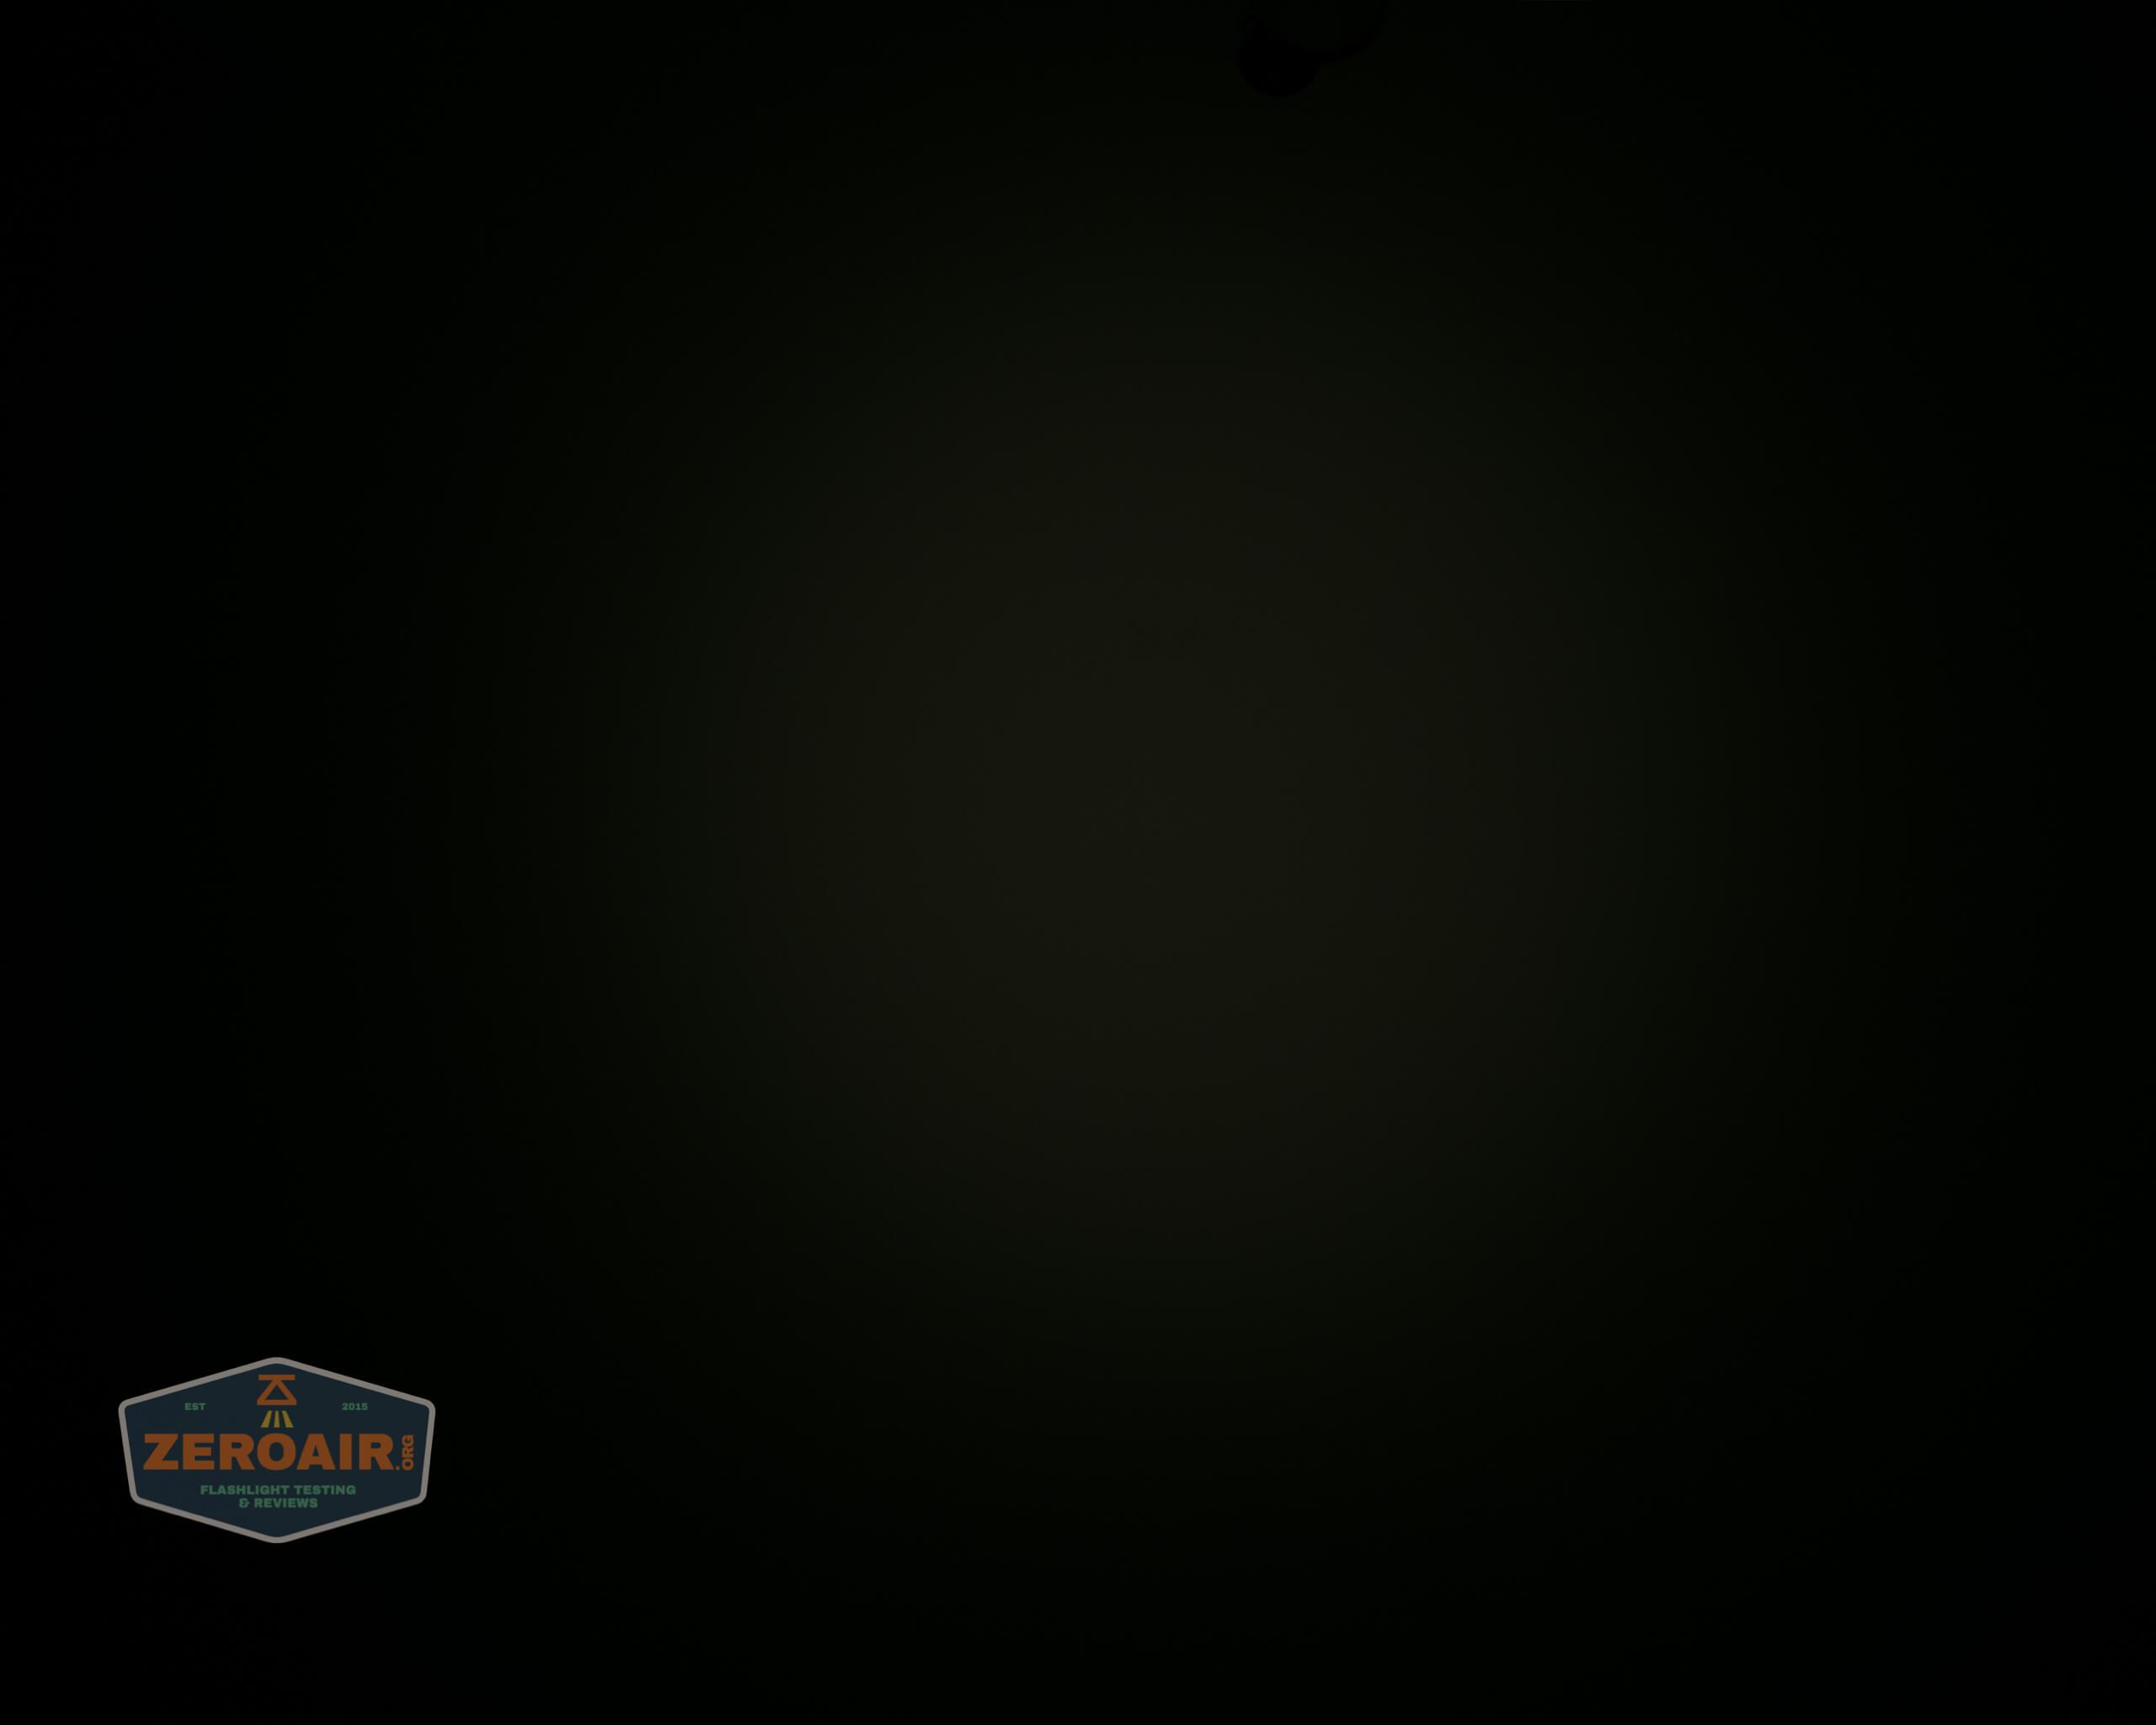 manker e14iii 18650 flood flashlight beamshot ceiling 4